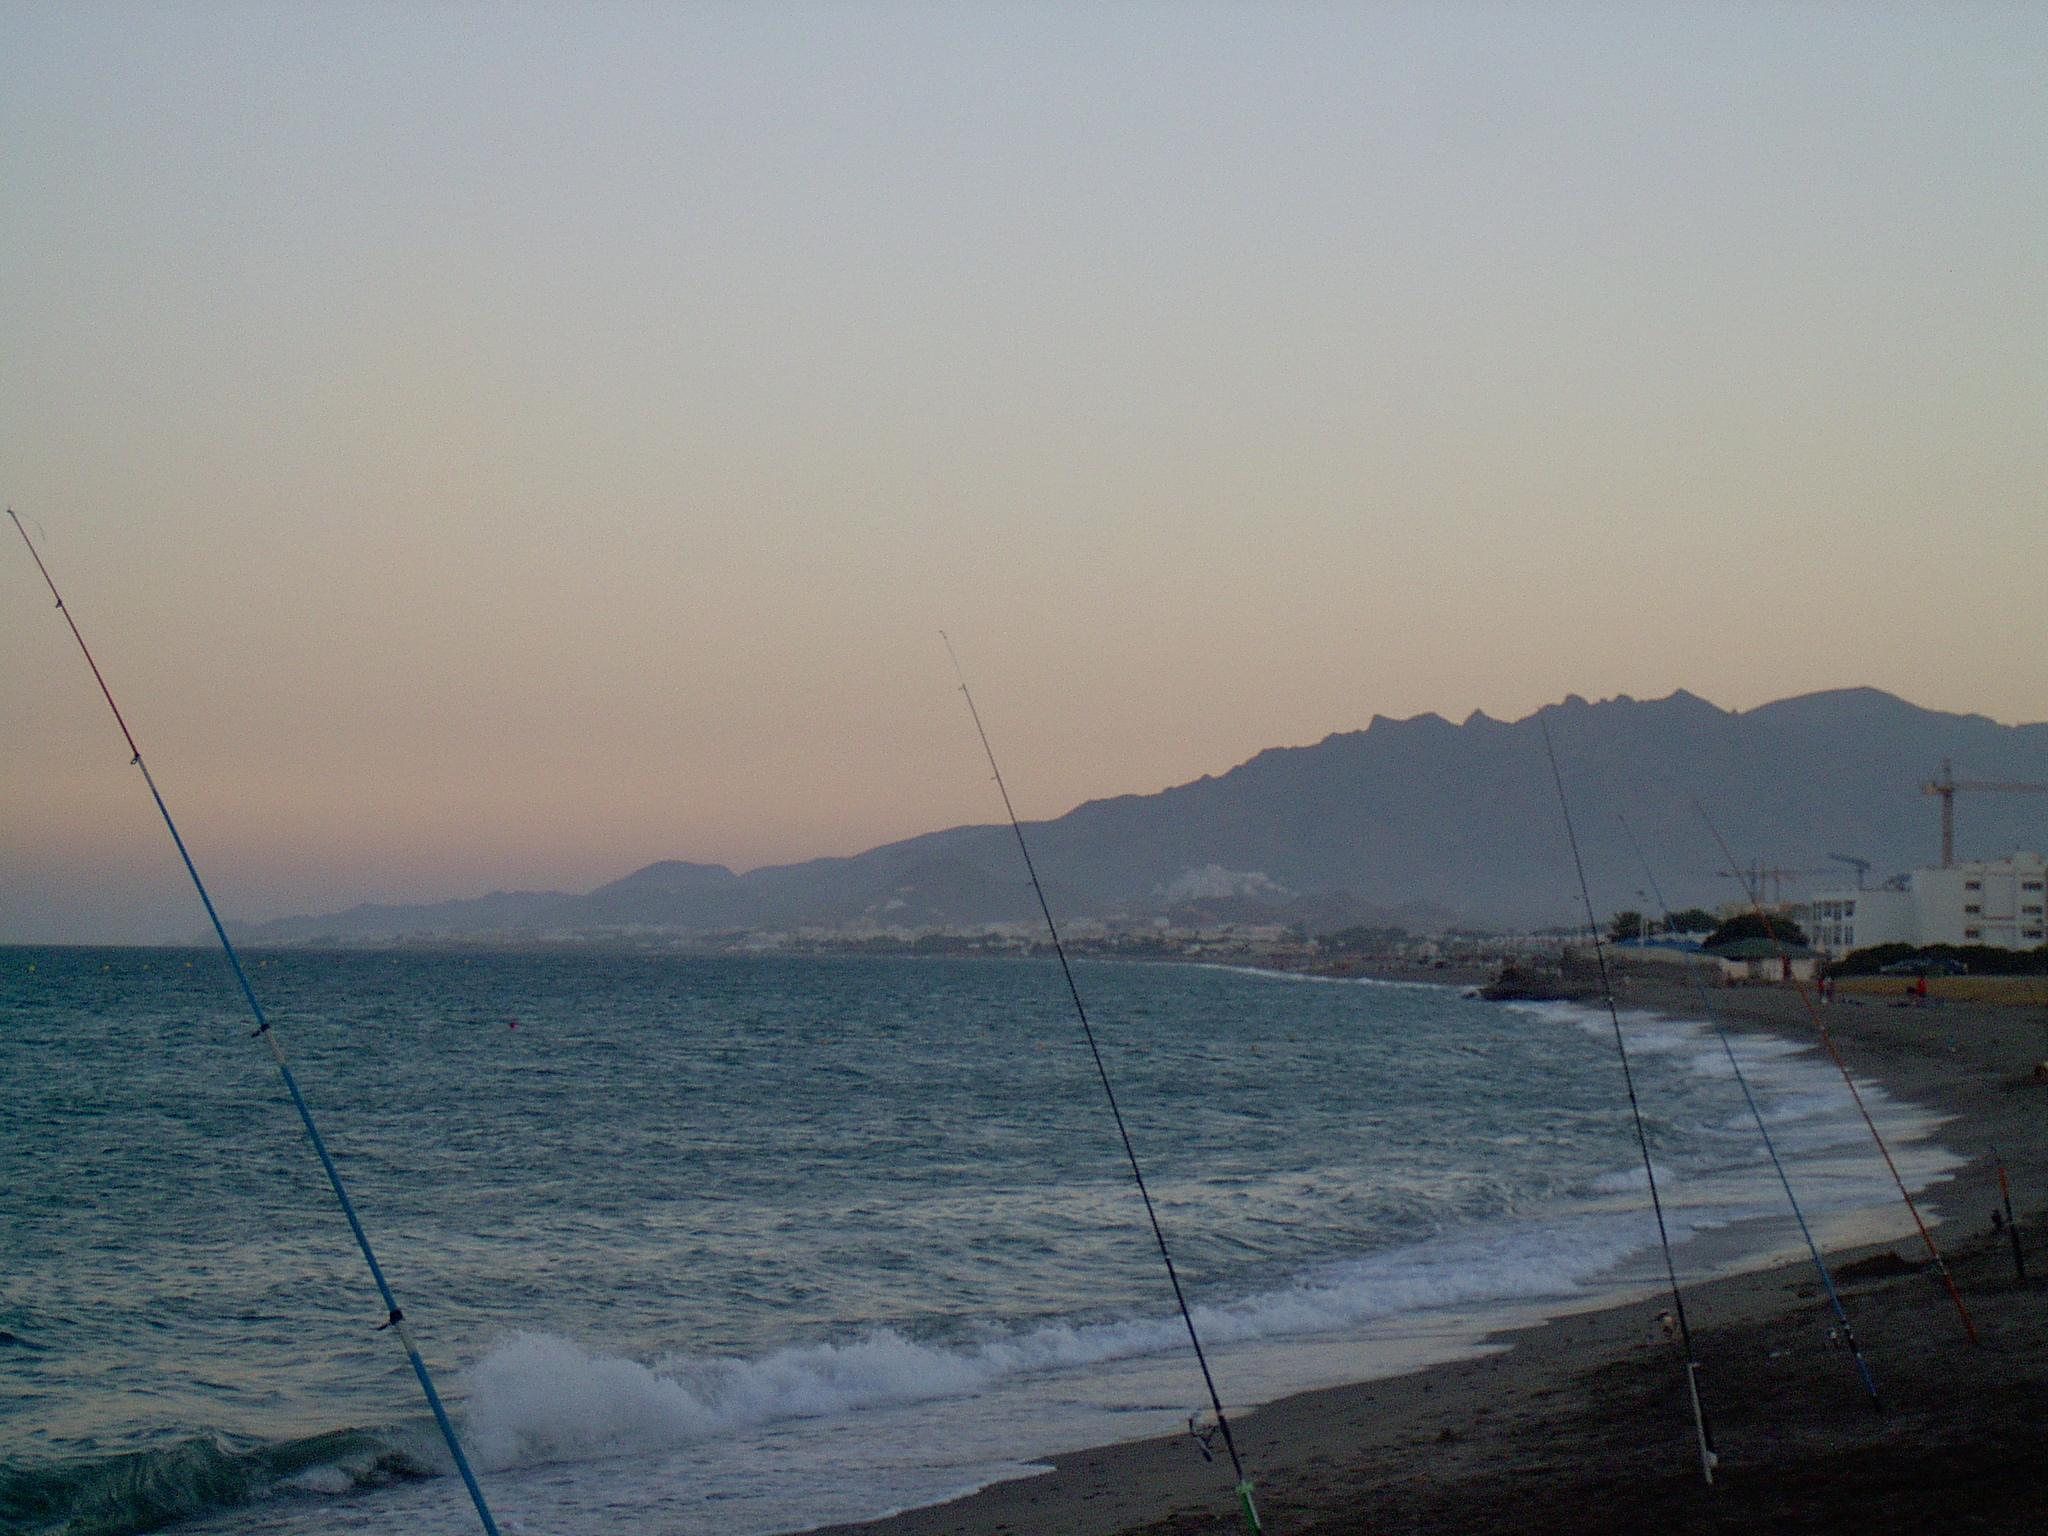 Playa Fábrica del Duro